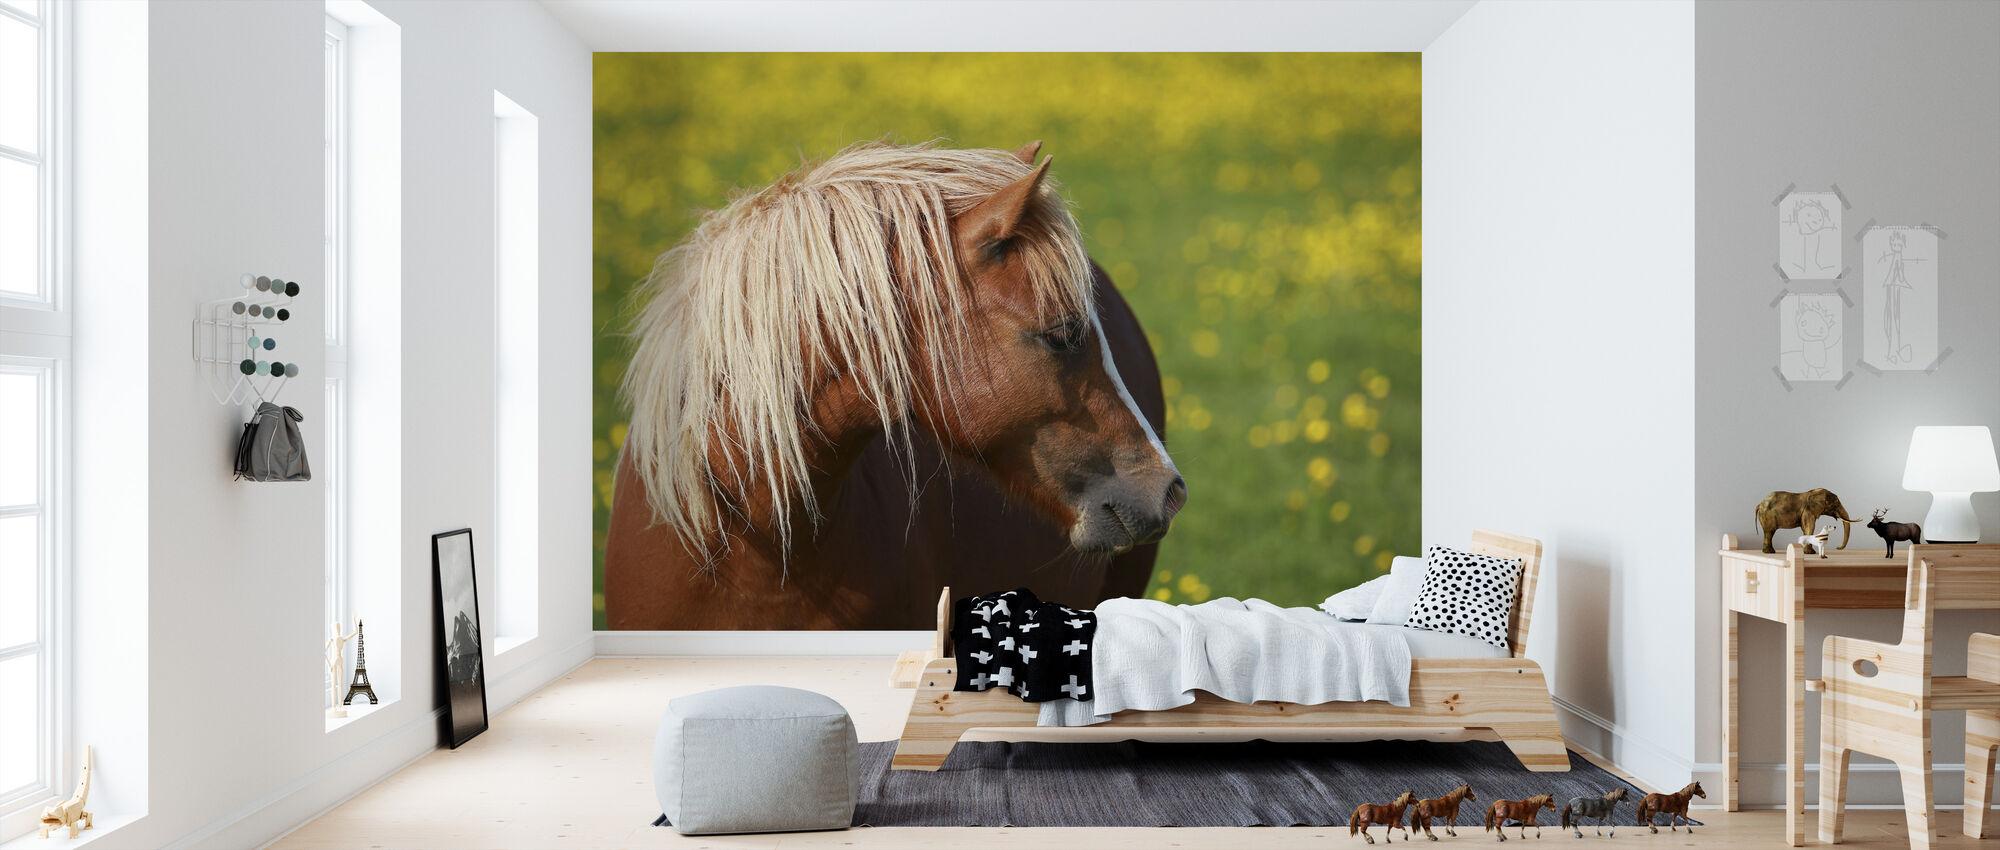 Horse Profile - Wallpaper - Kids Room